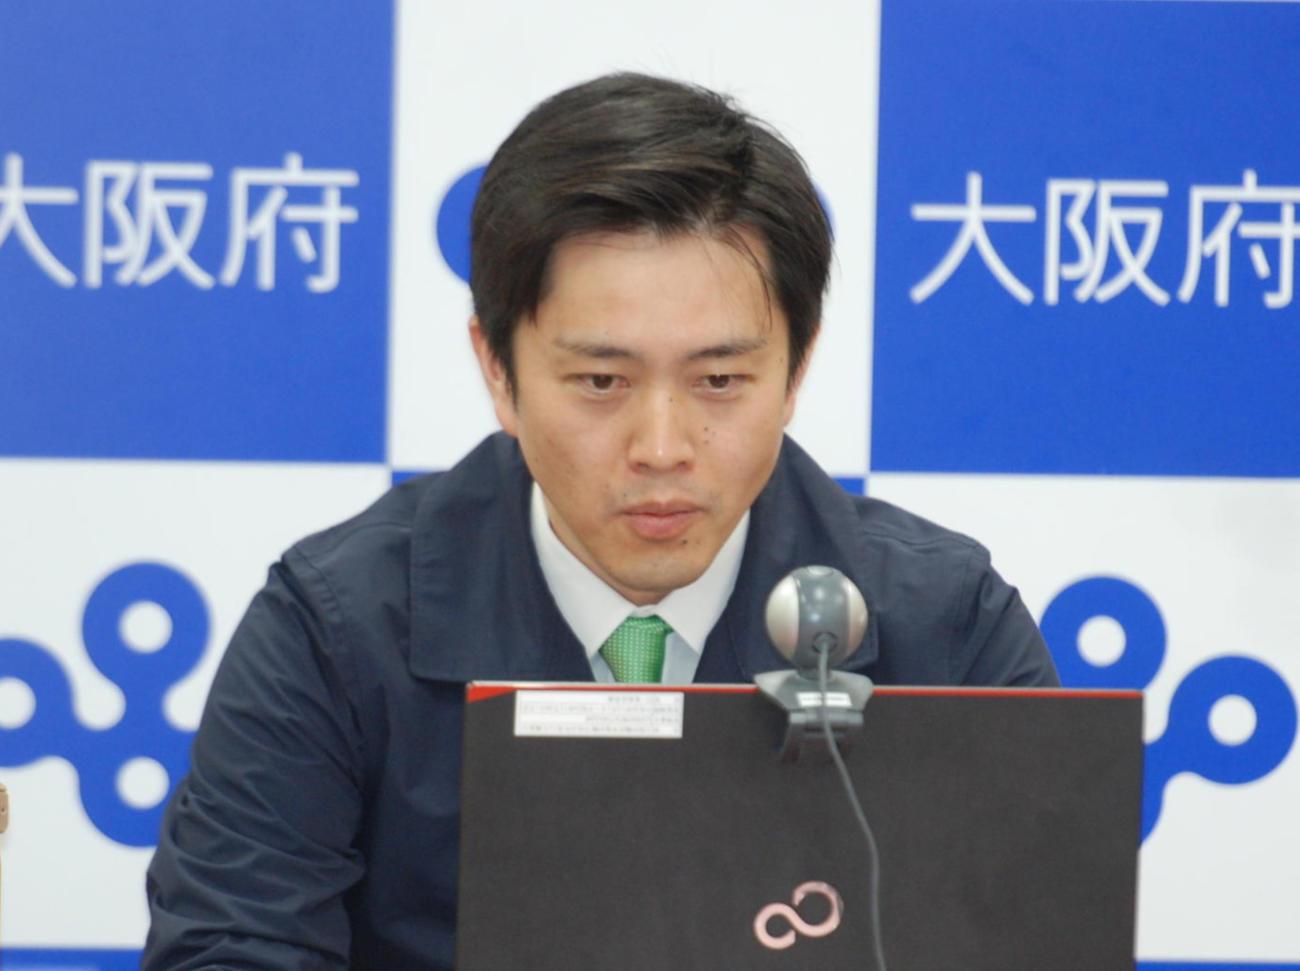 吉村洋文知事(2021年4月4日撮影)